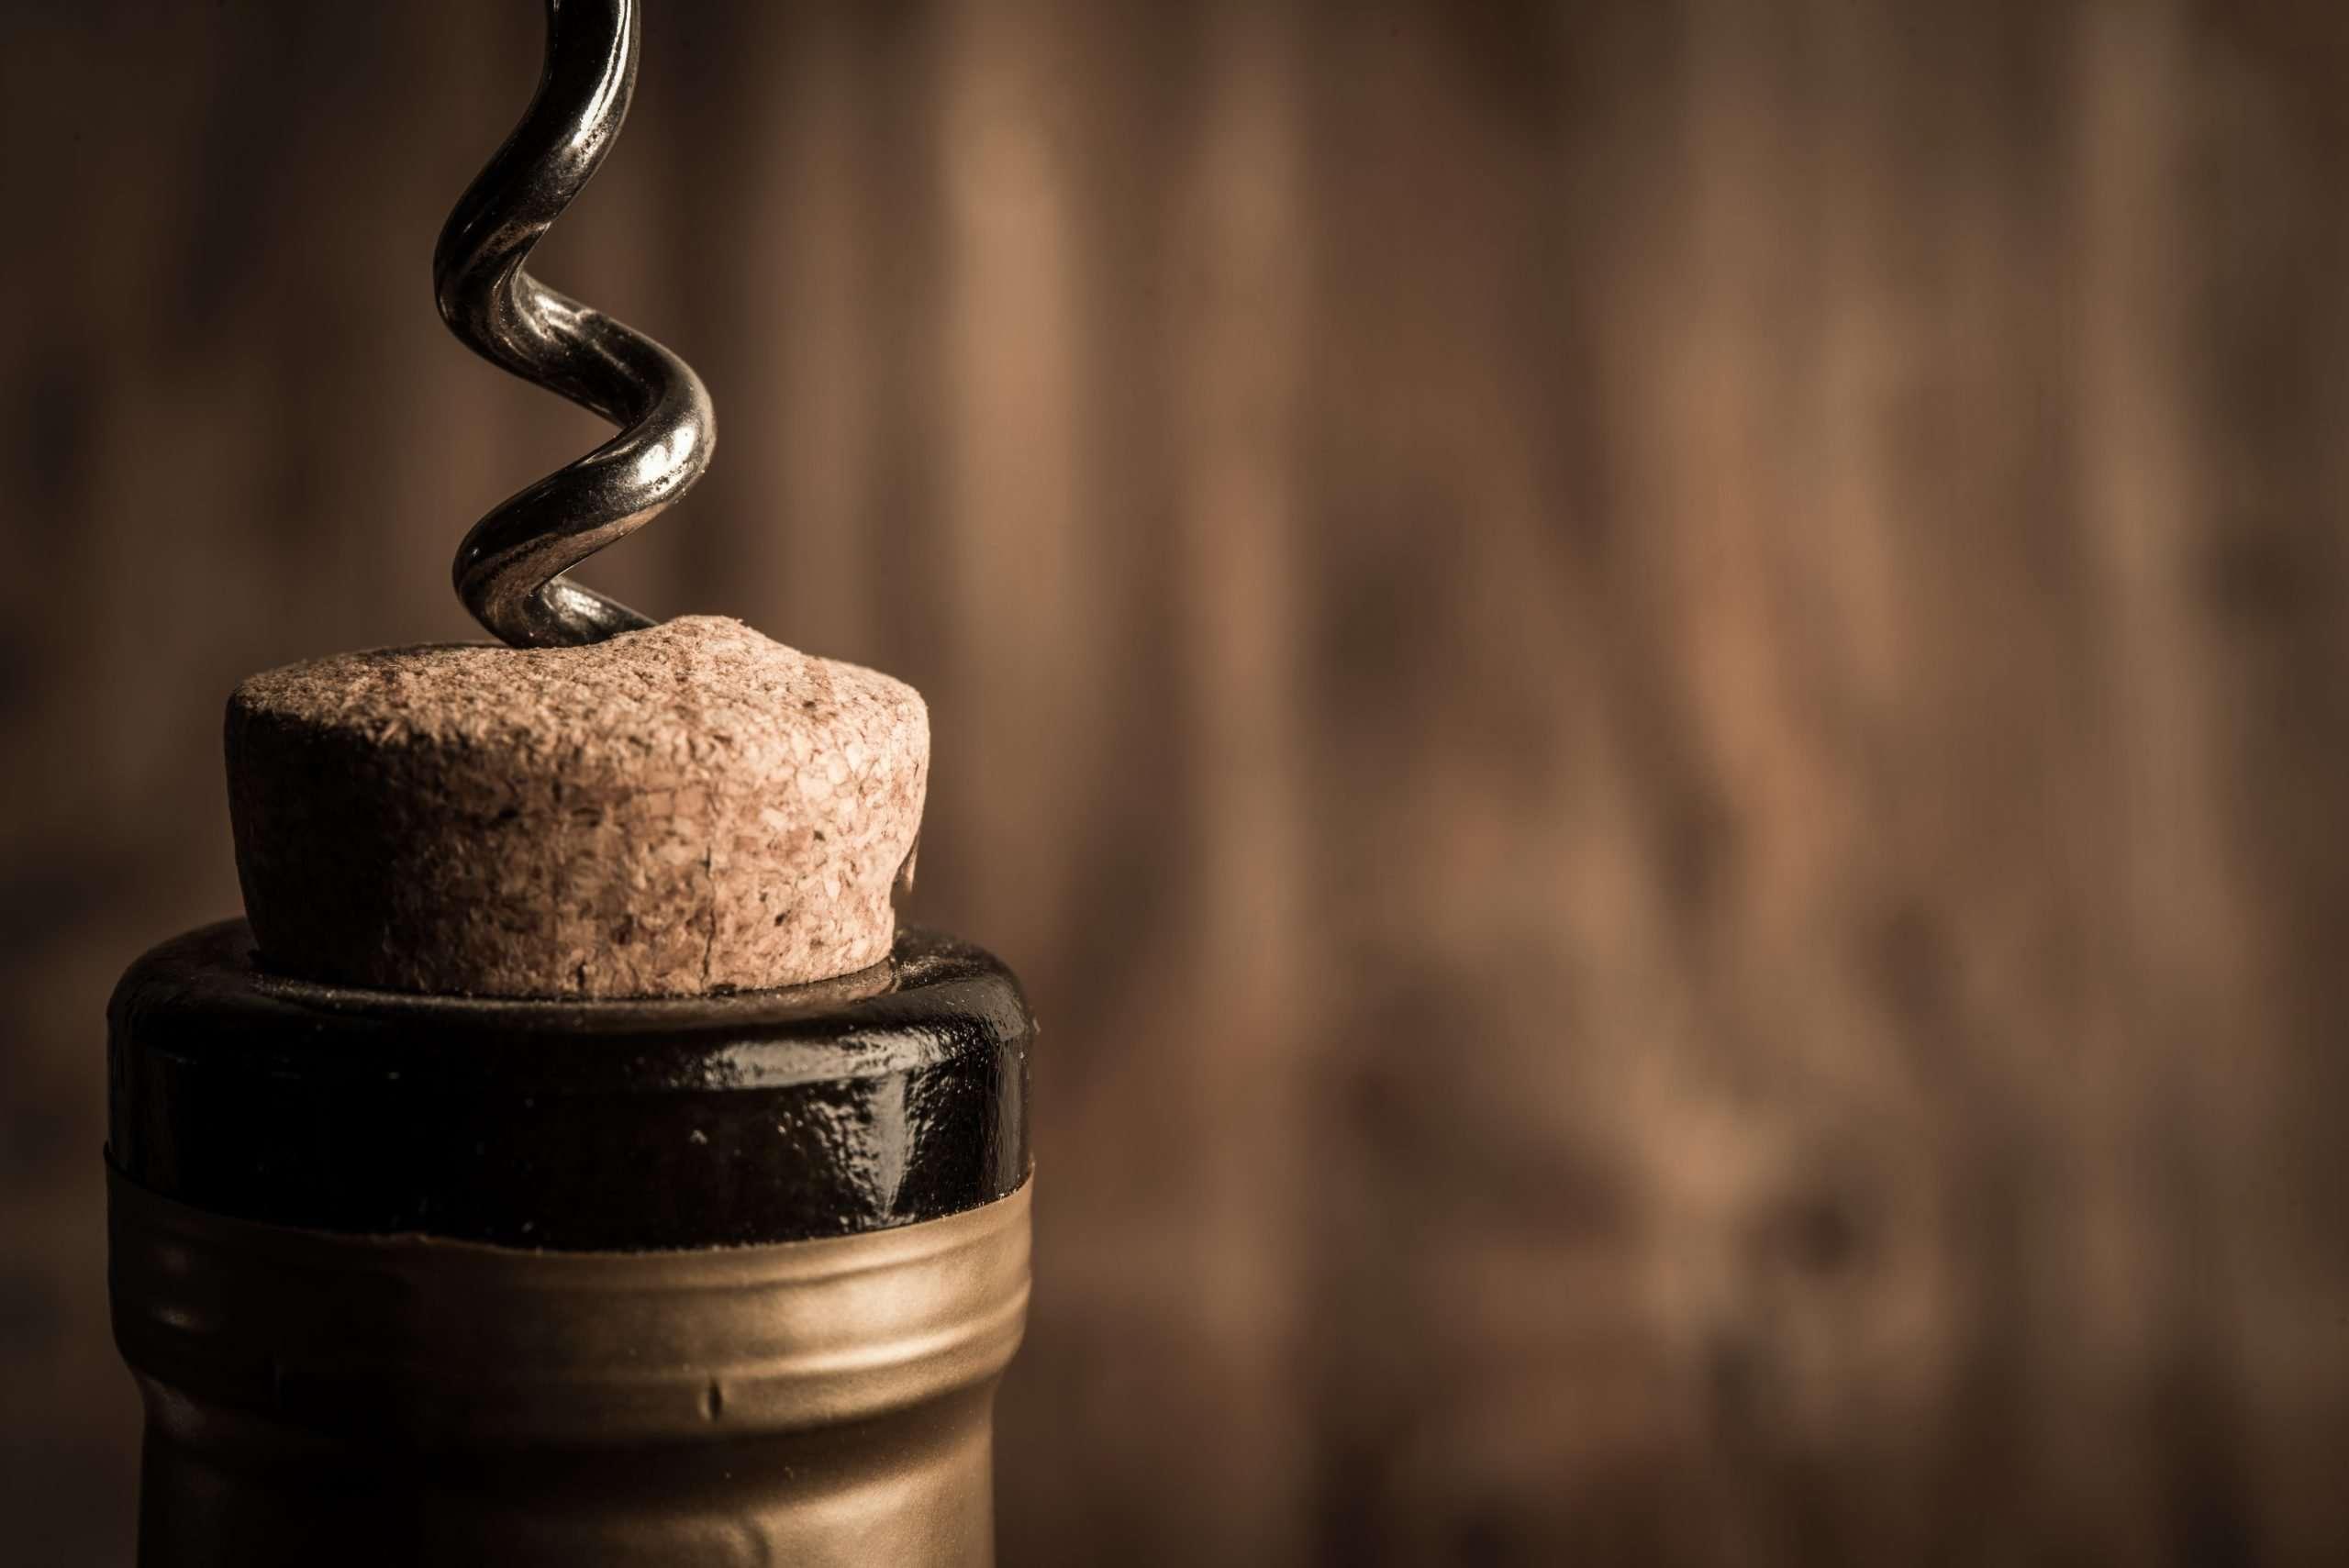 200 millions de litres de vin bientôt transformés en gel hydroalcoolique.